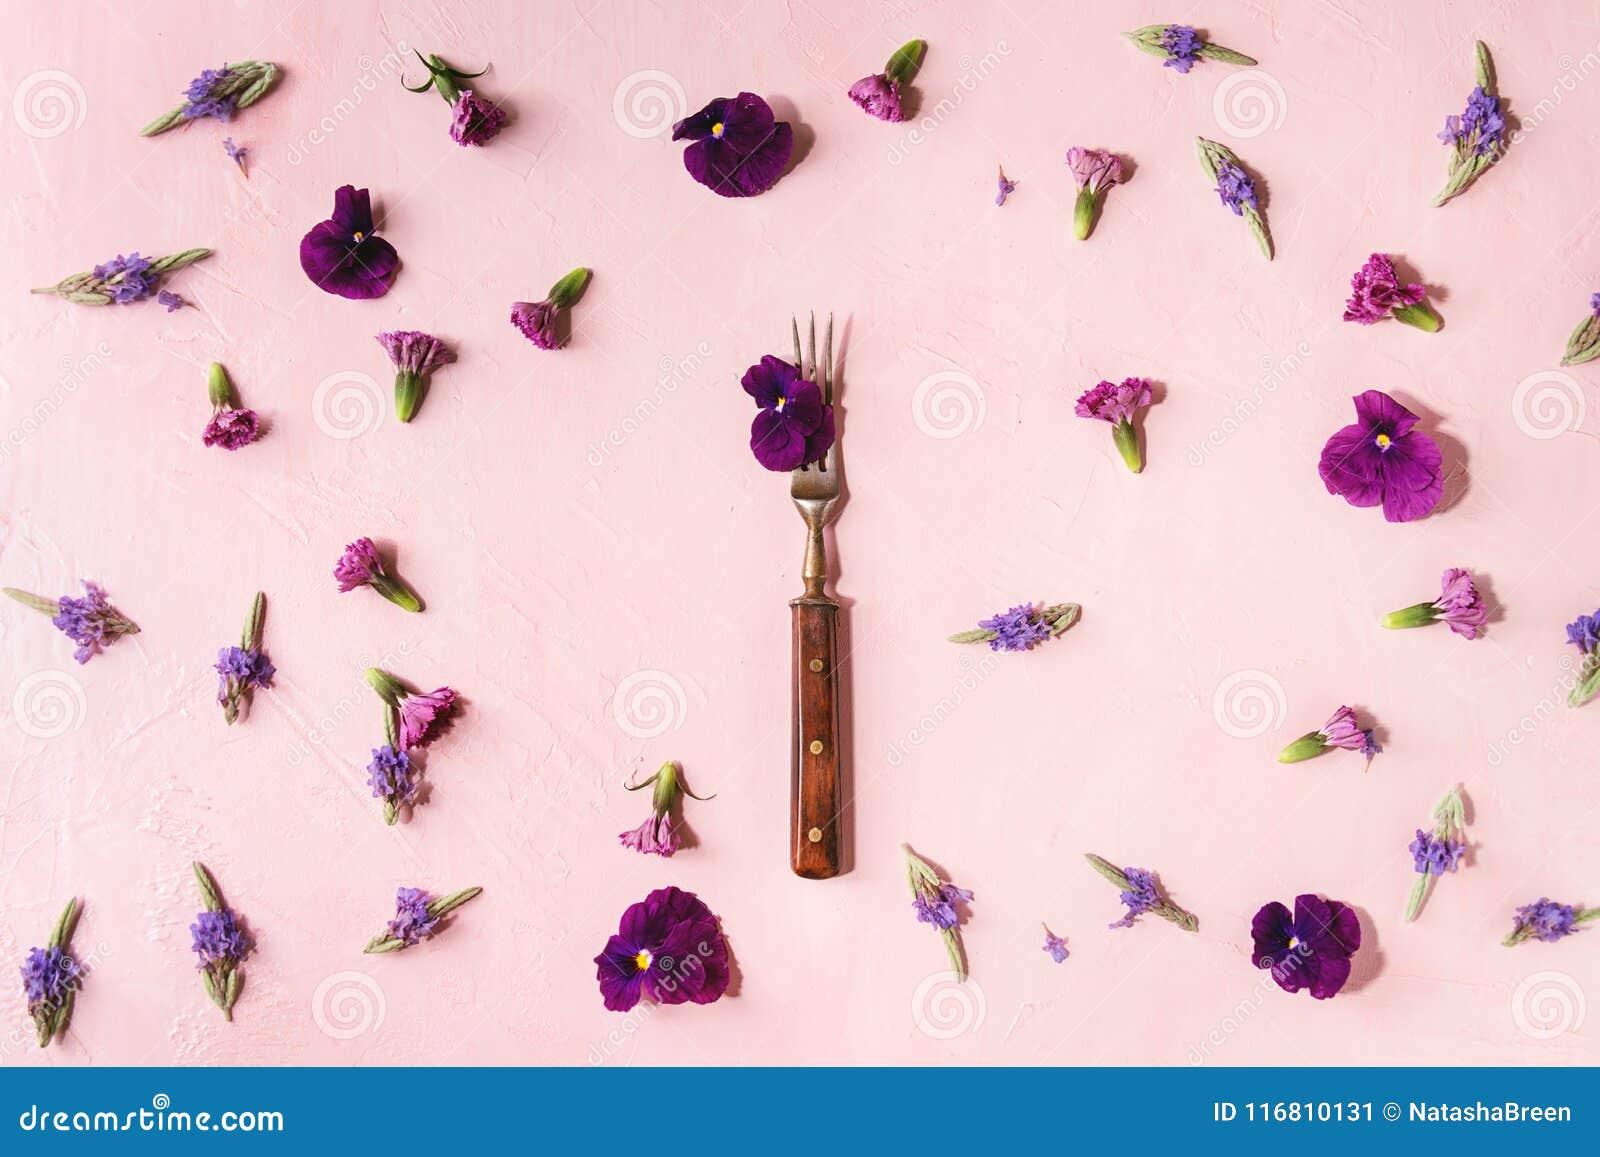 Purple Edible Flowers Stock Image Image Of Herb Edibles 116810131